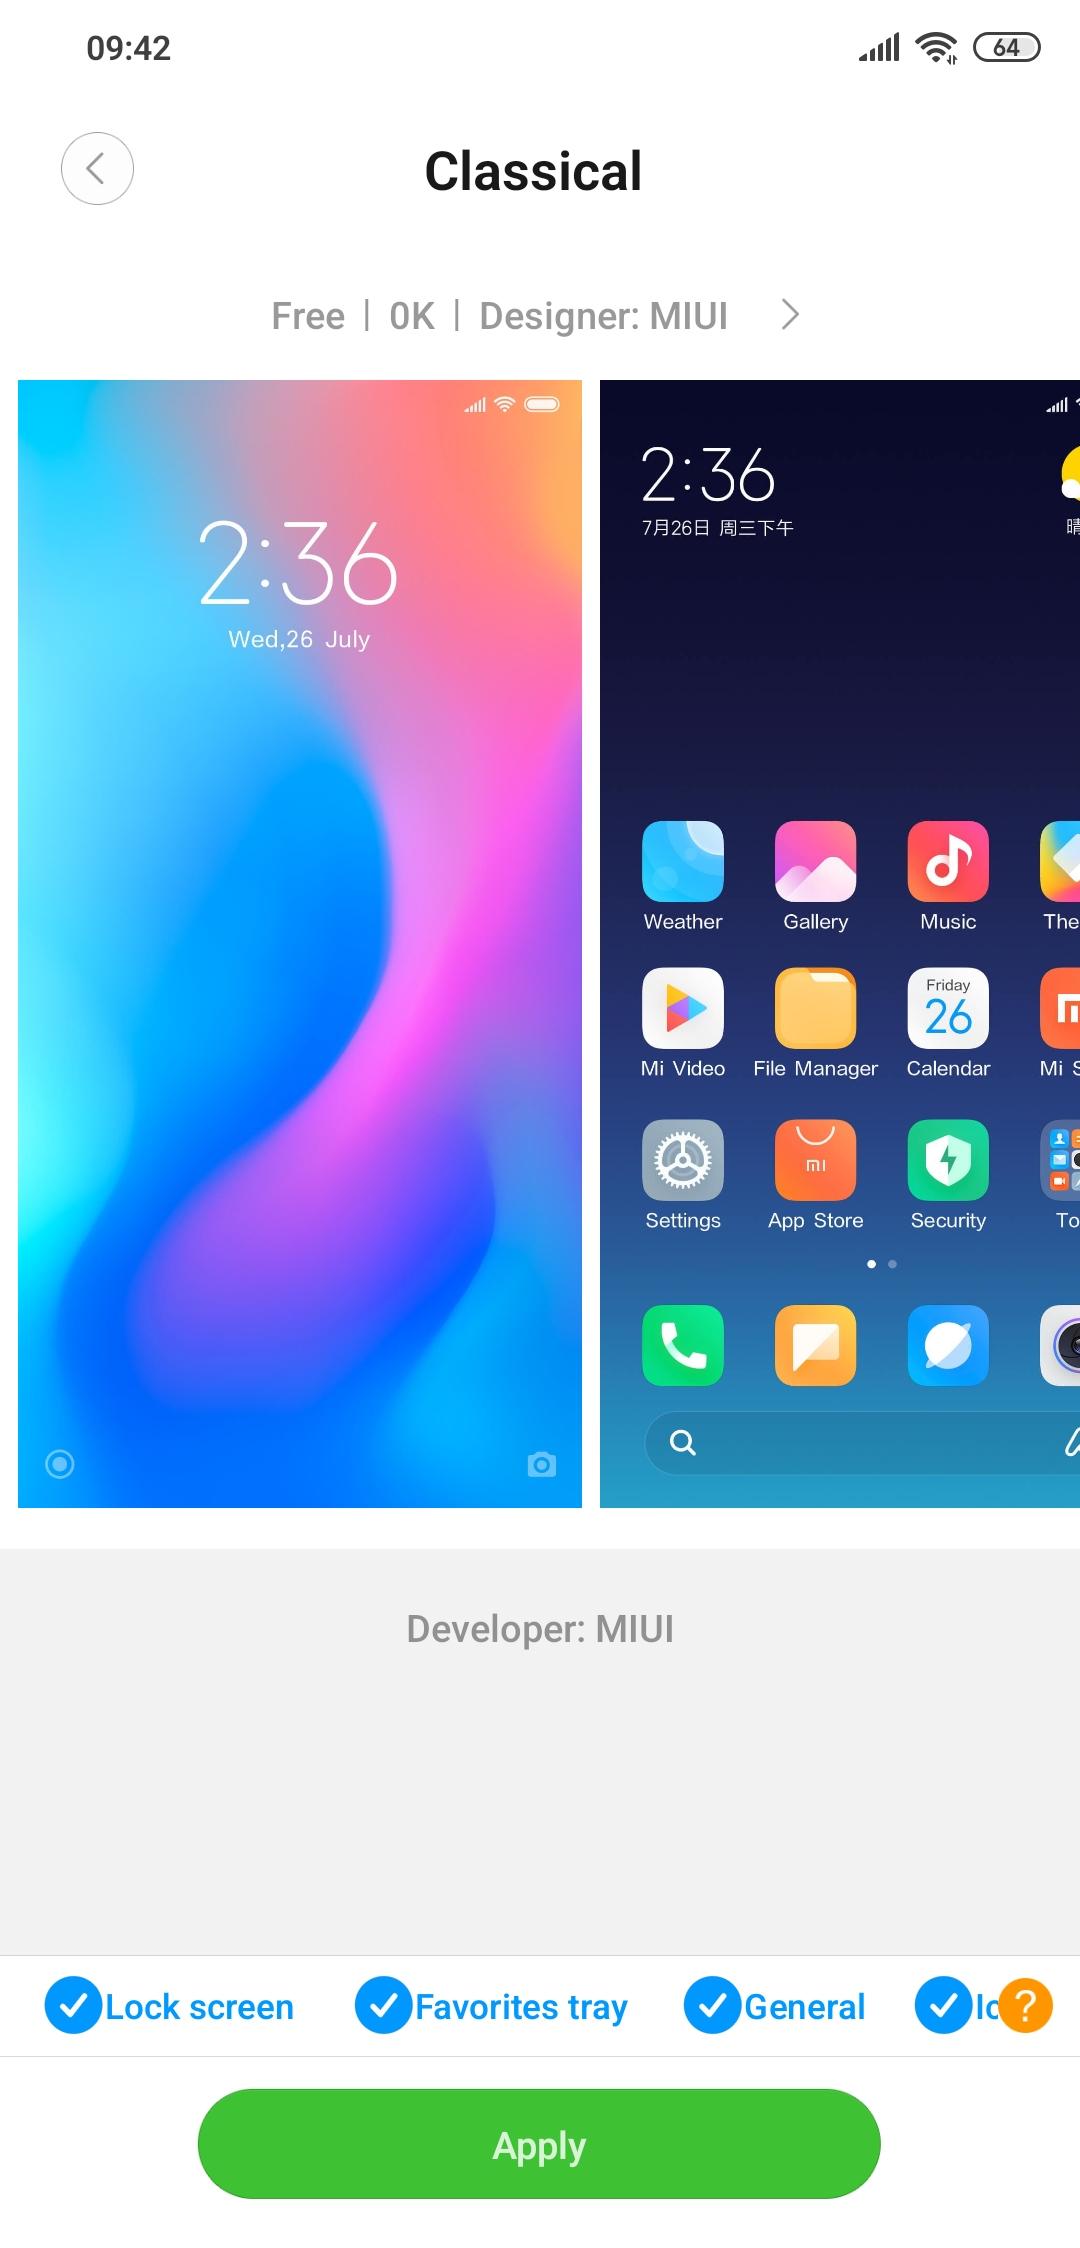 Screenshot_2019-10-06-09-42-19-766_com.android.thememanager.jpg